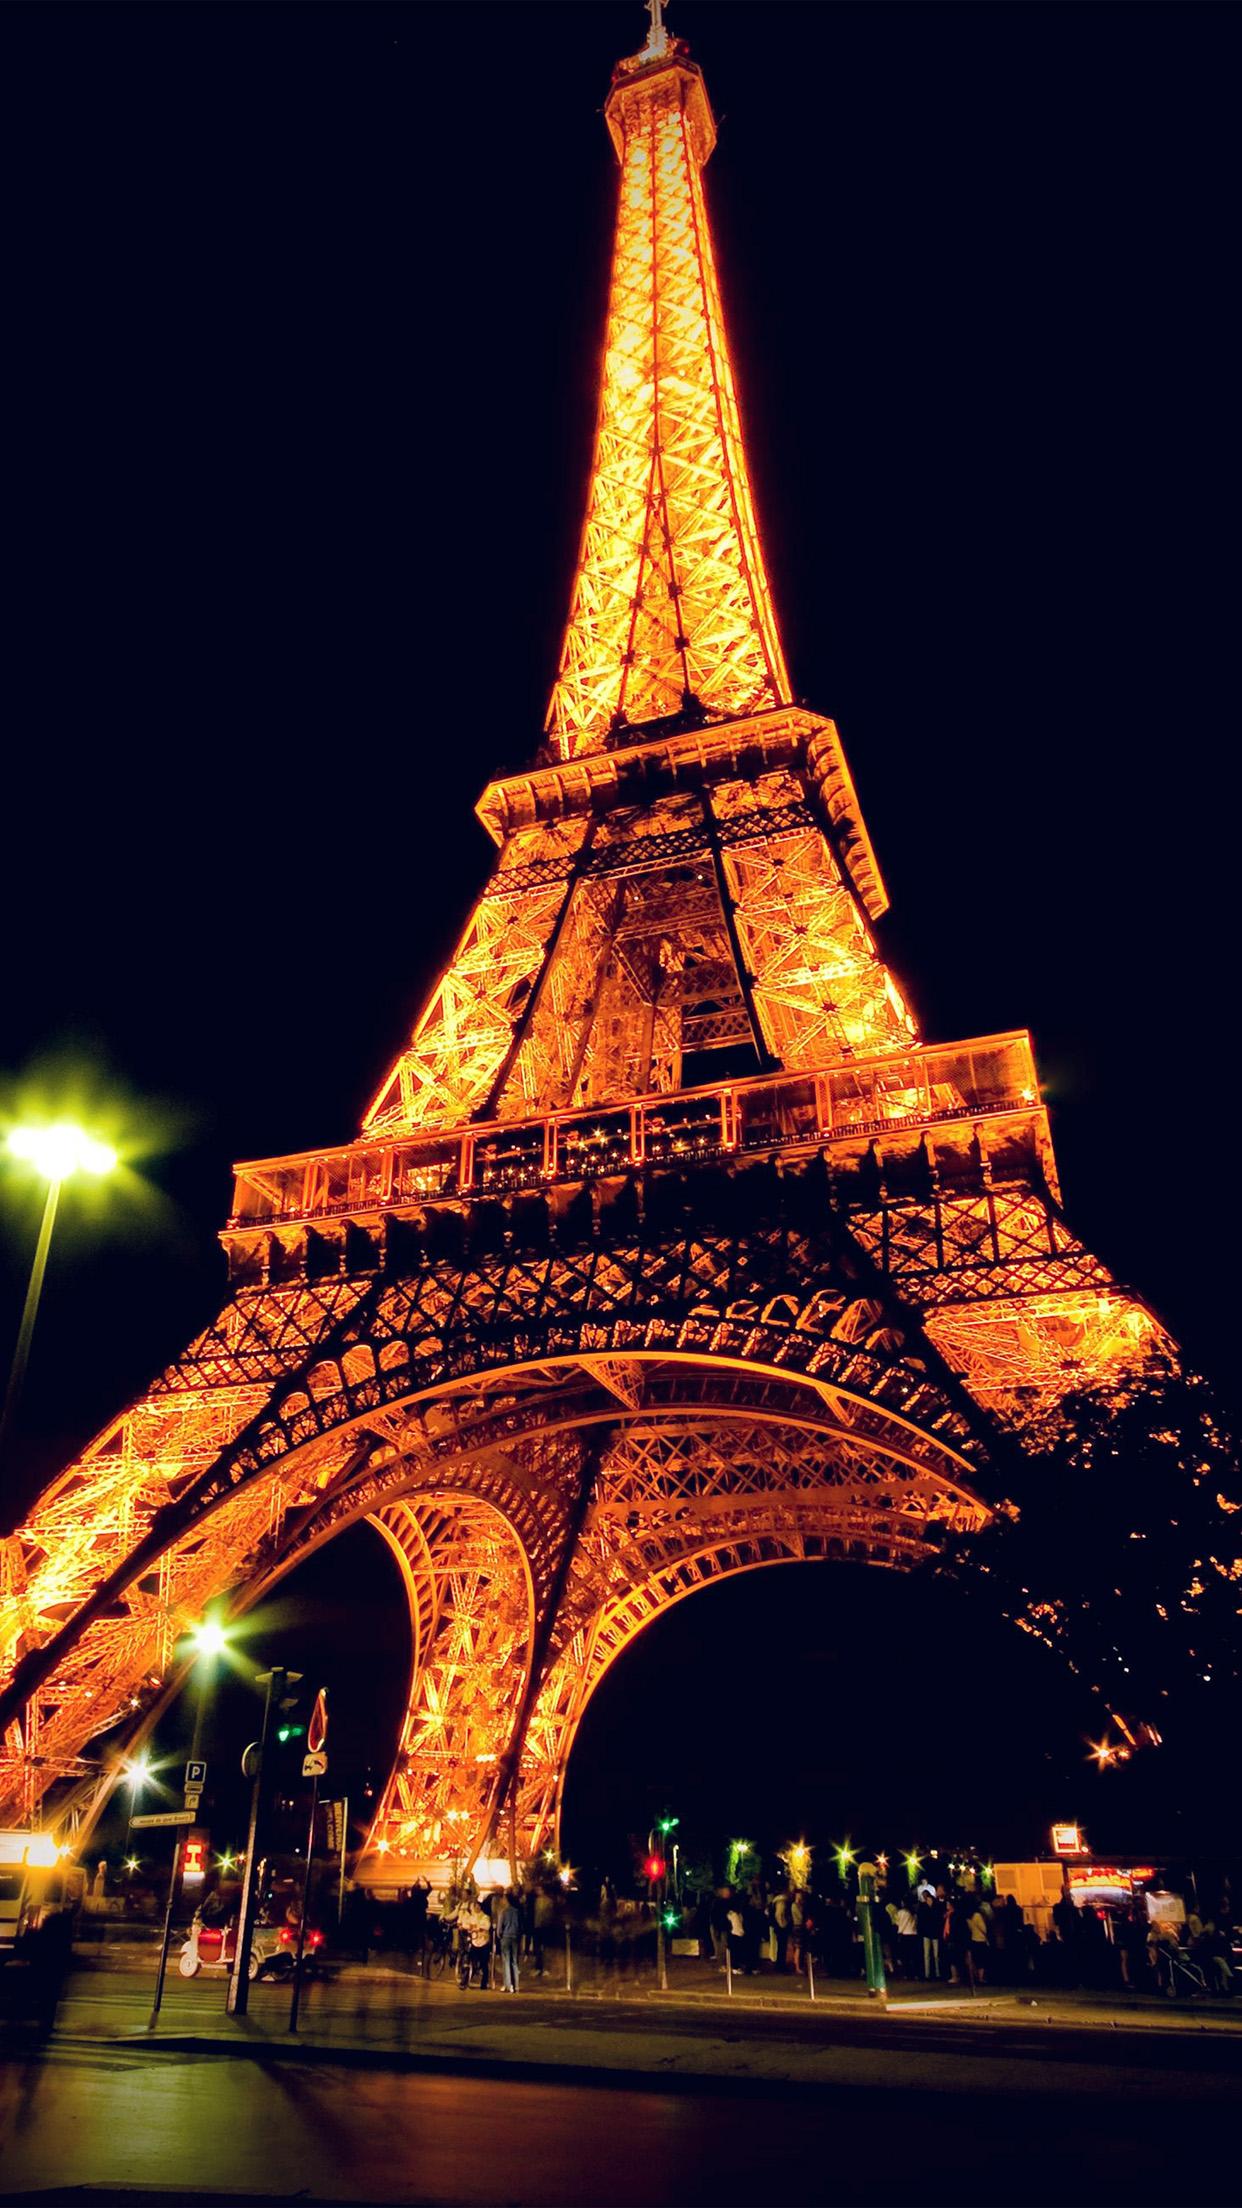 Cute Eiffel Tower Wallpaper For Iphone Bc23 Eiffel Tower Paris Night Art Illustration Wallpaper